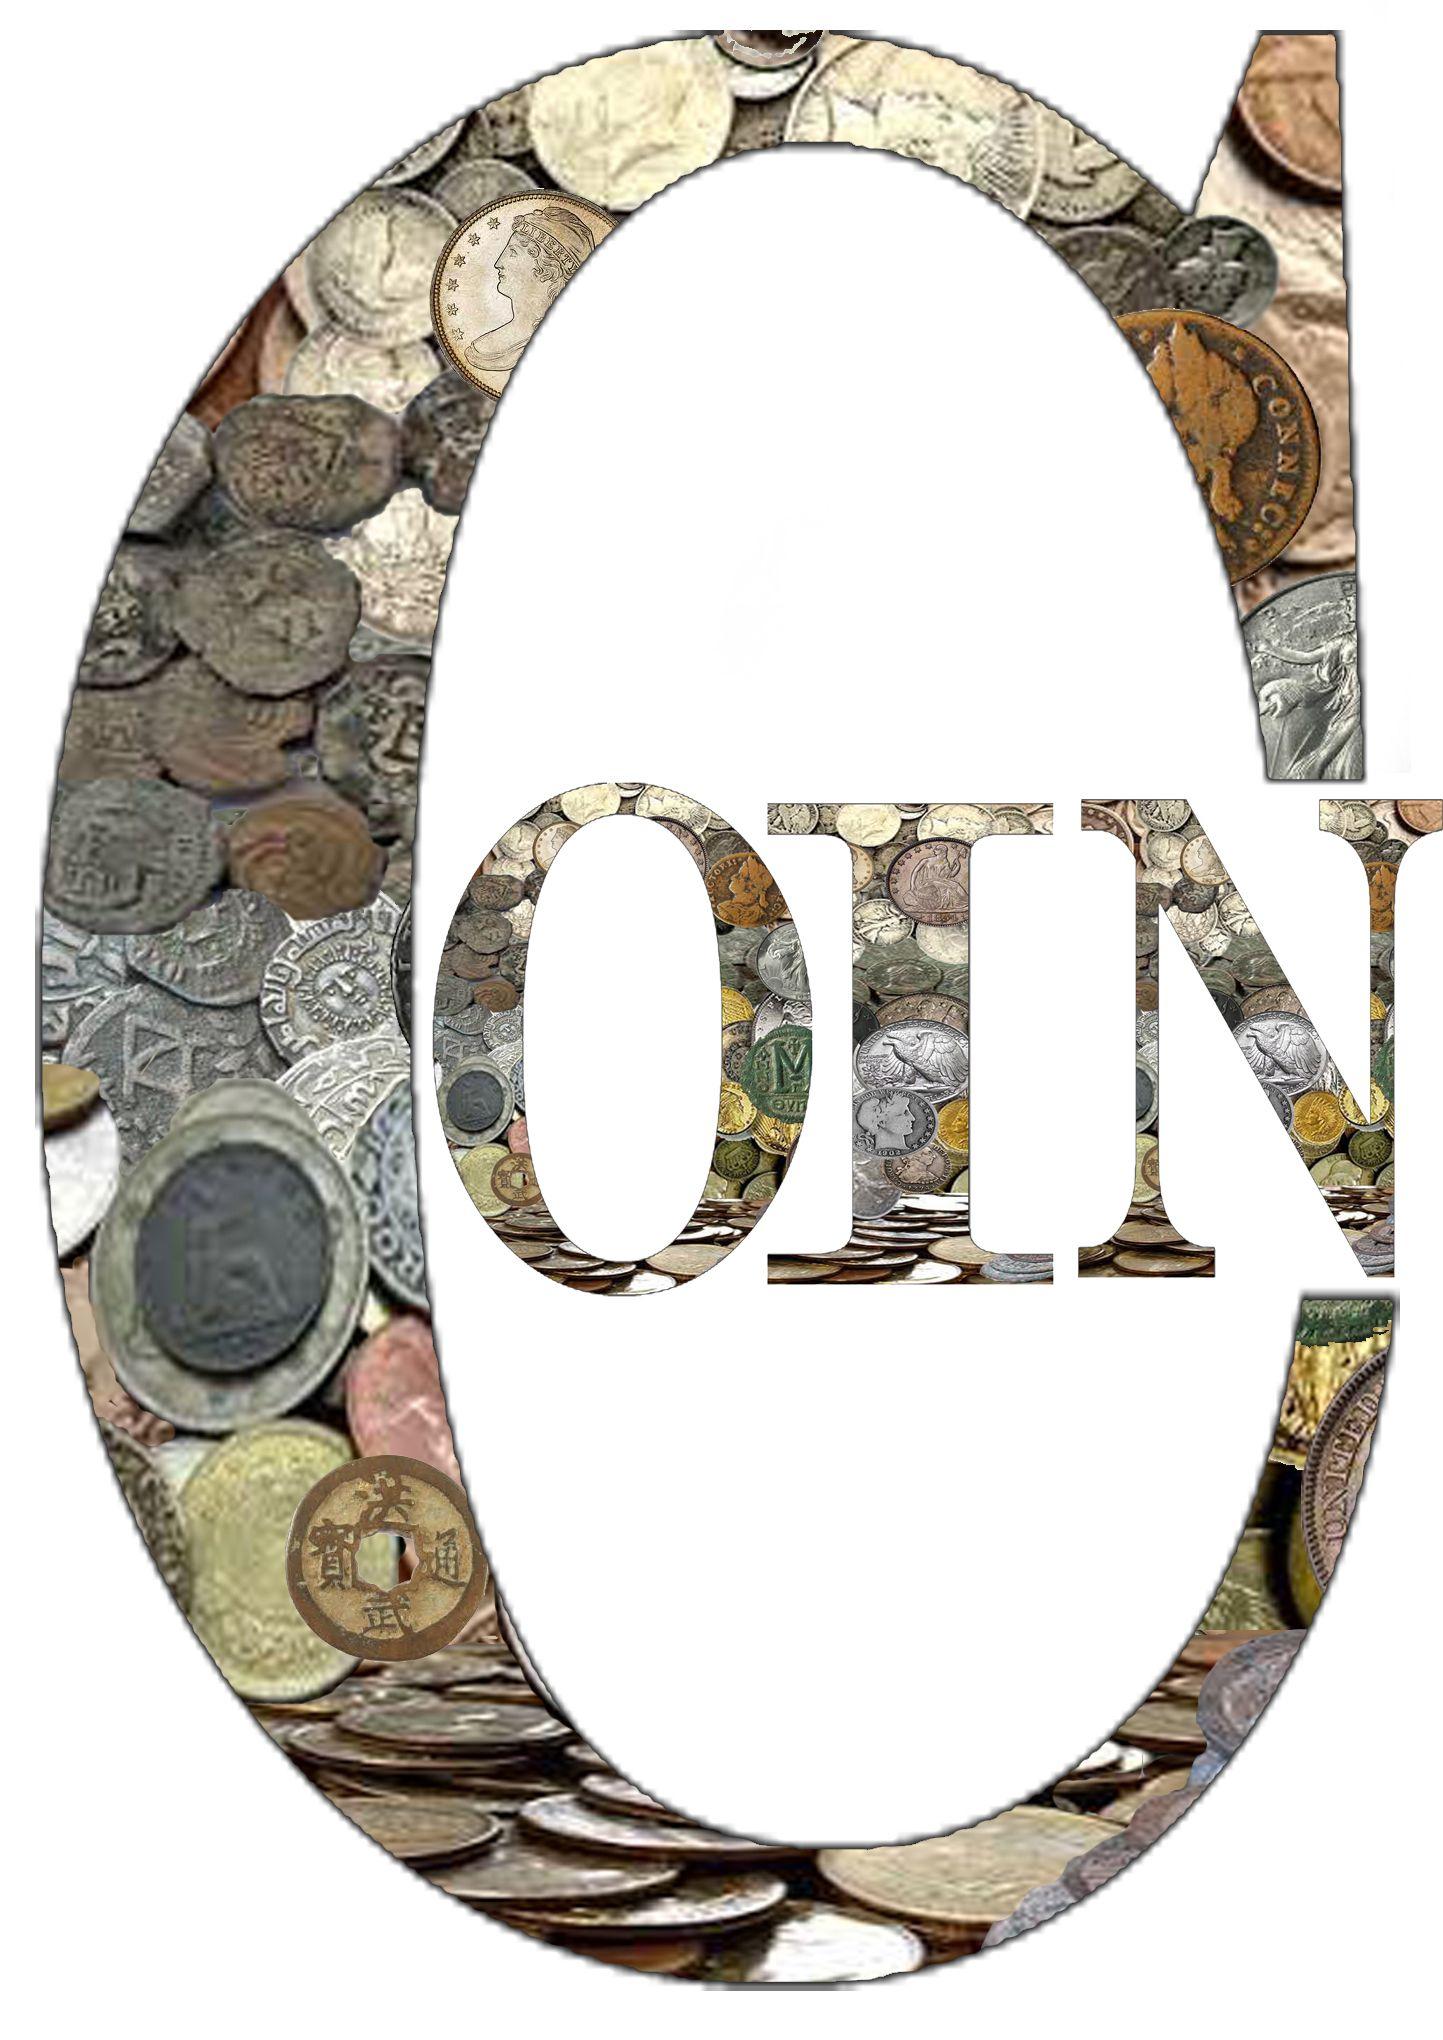 Coin Hobbies